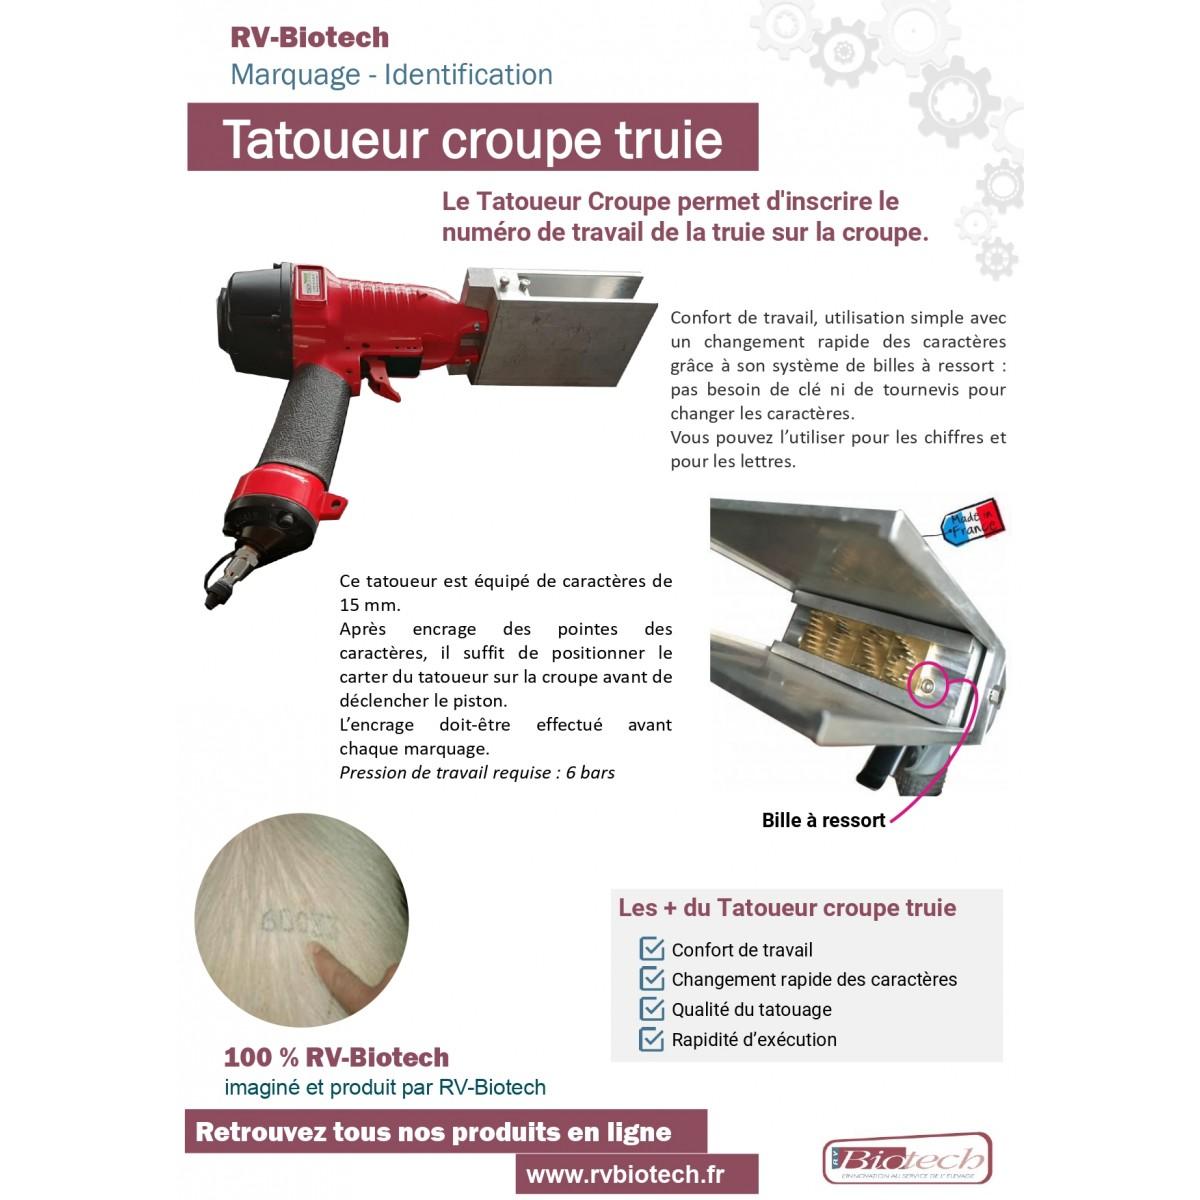 Tatoueur croupe truies RV Biotech BROCHURE